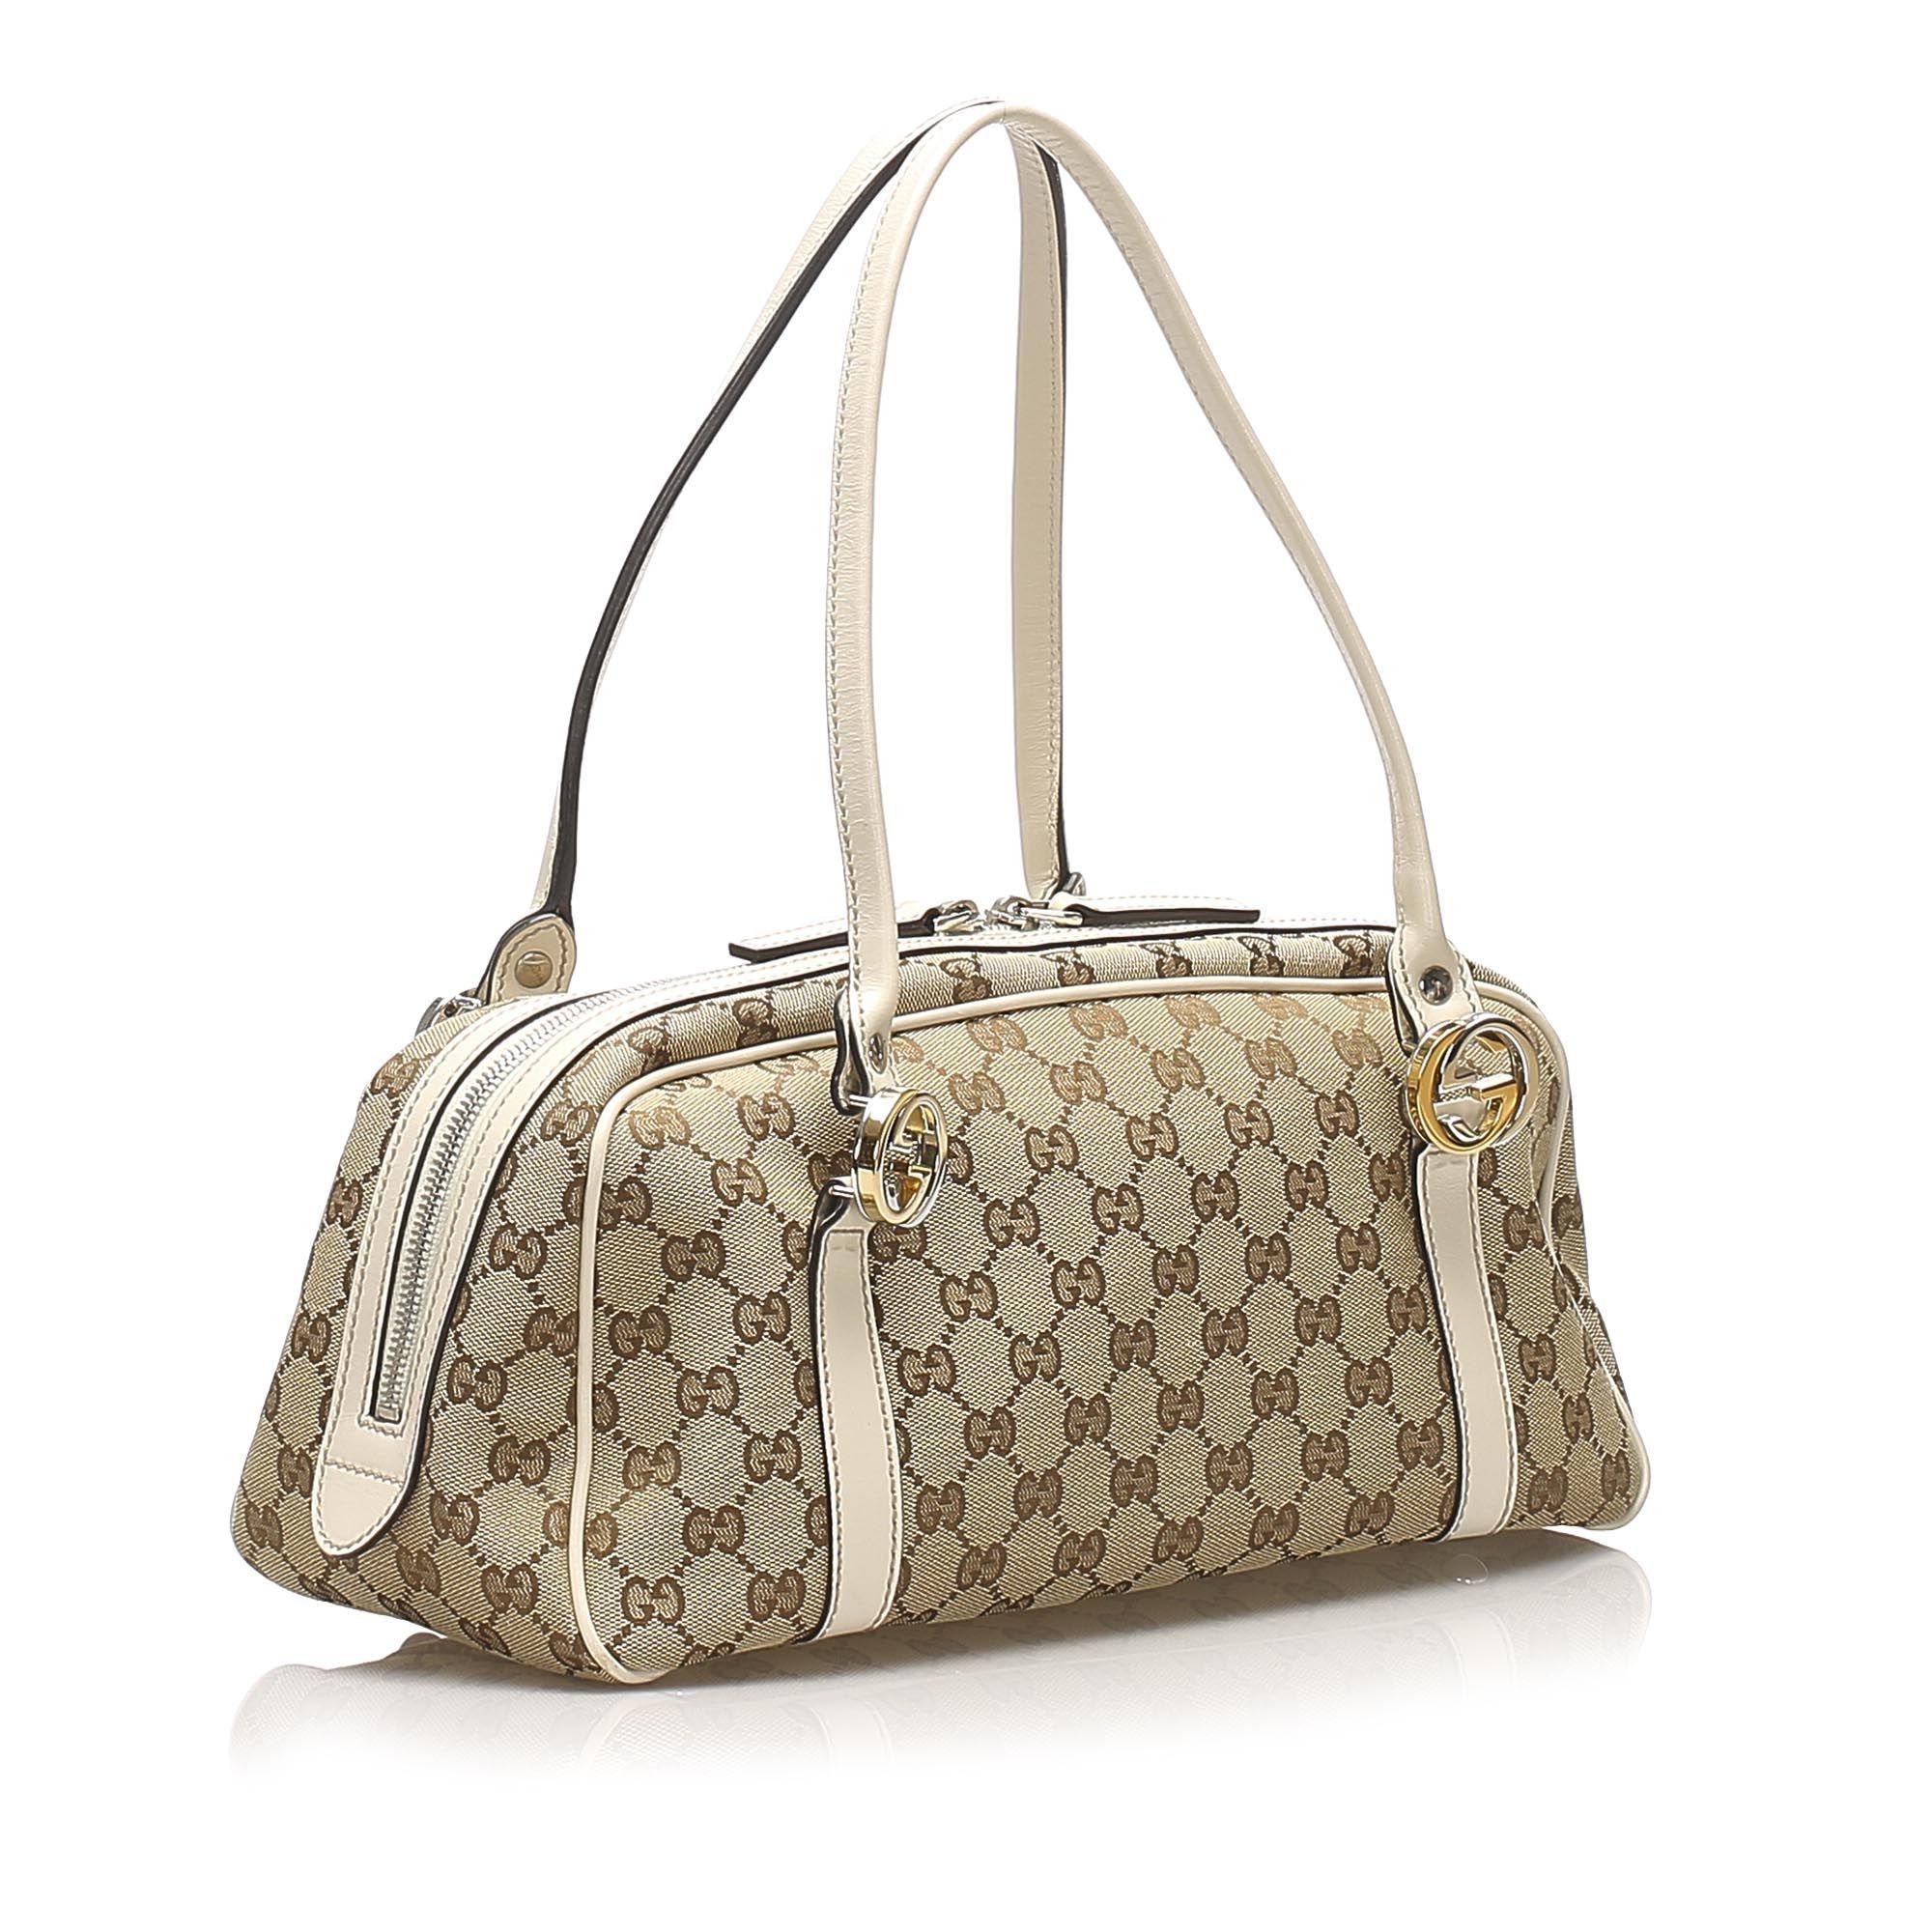 Vintage Gucci GG Canvas Twins Shoulder Bag Brown